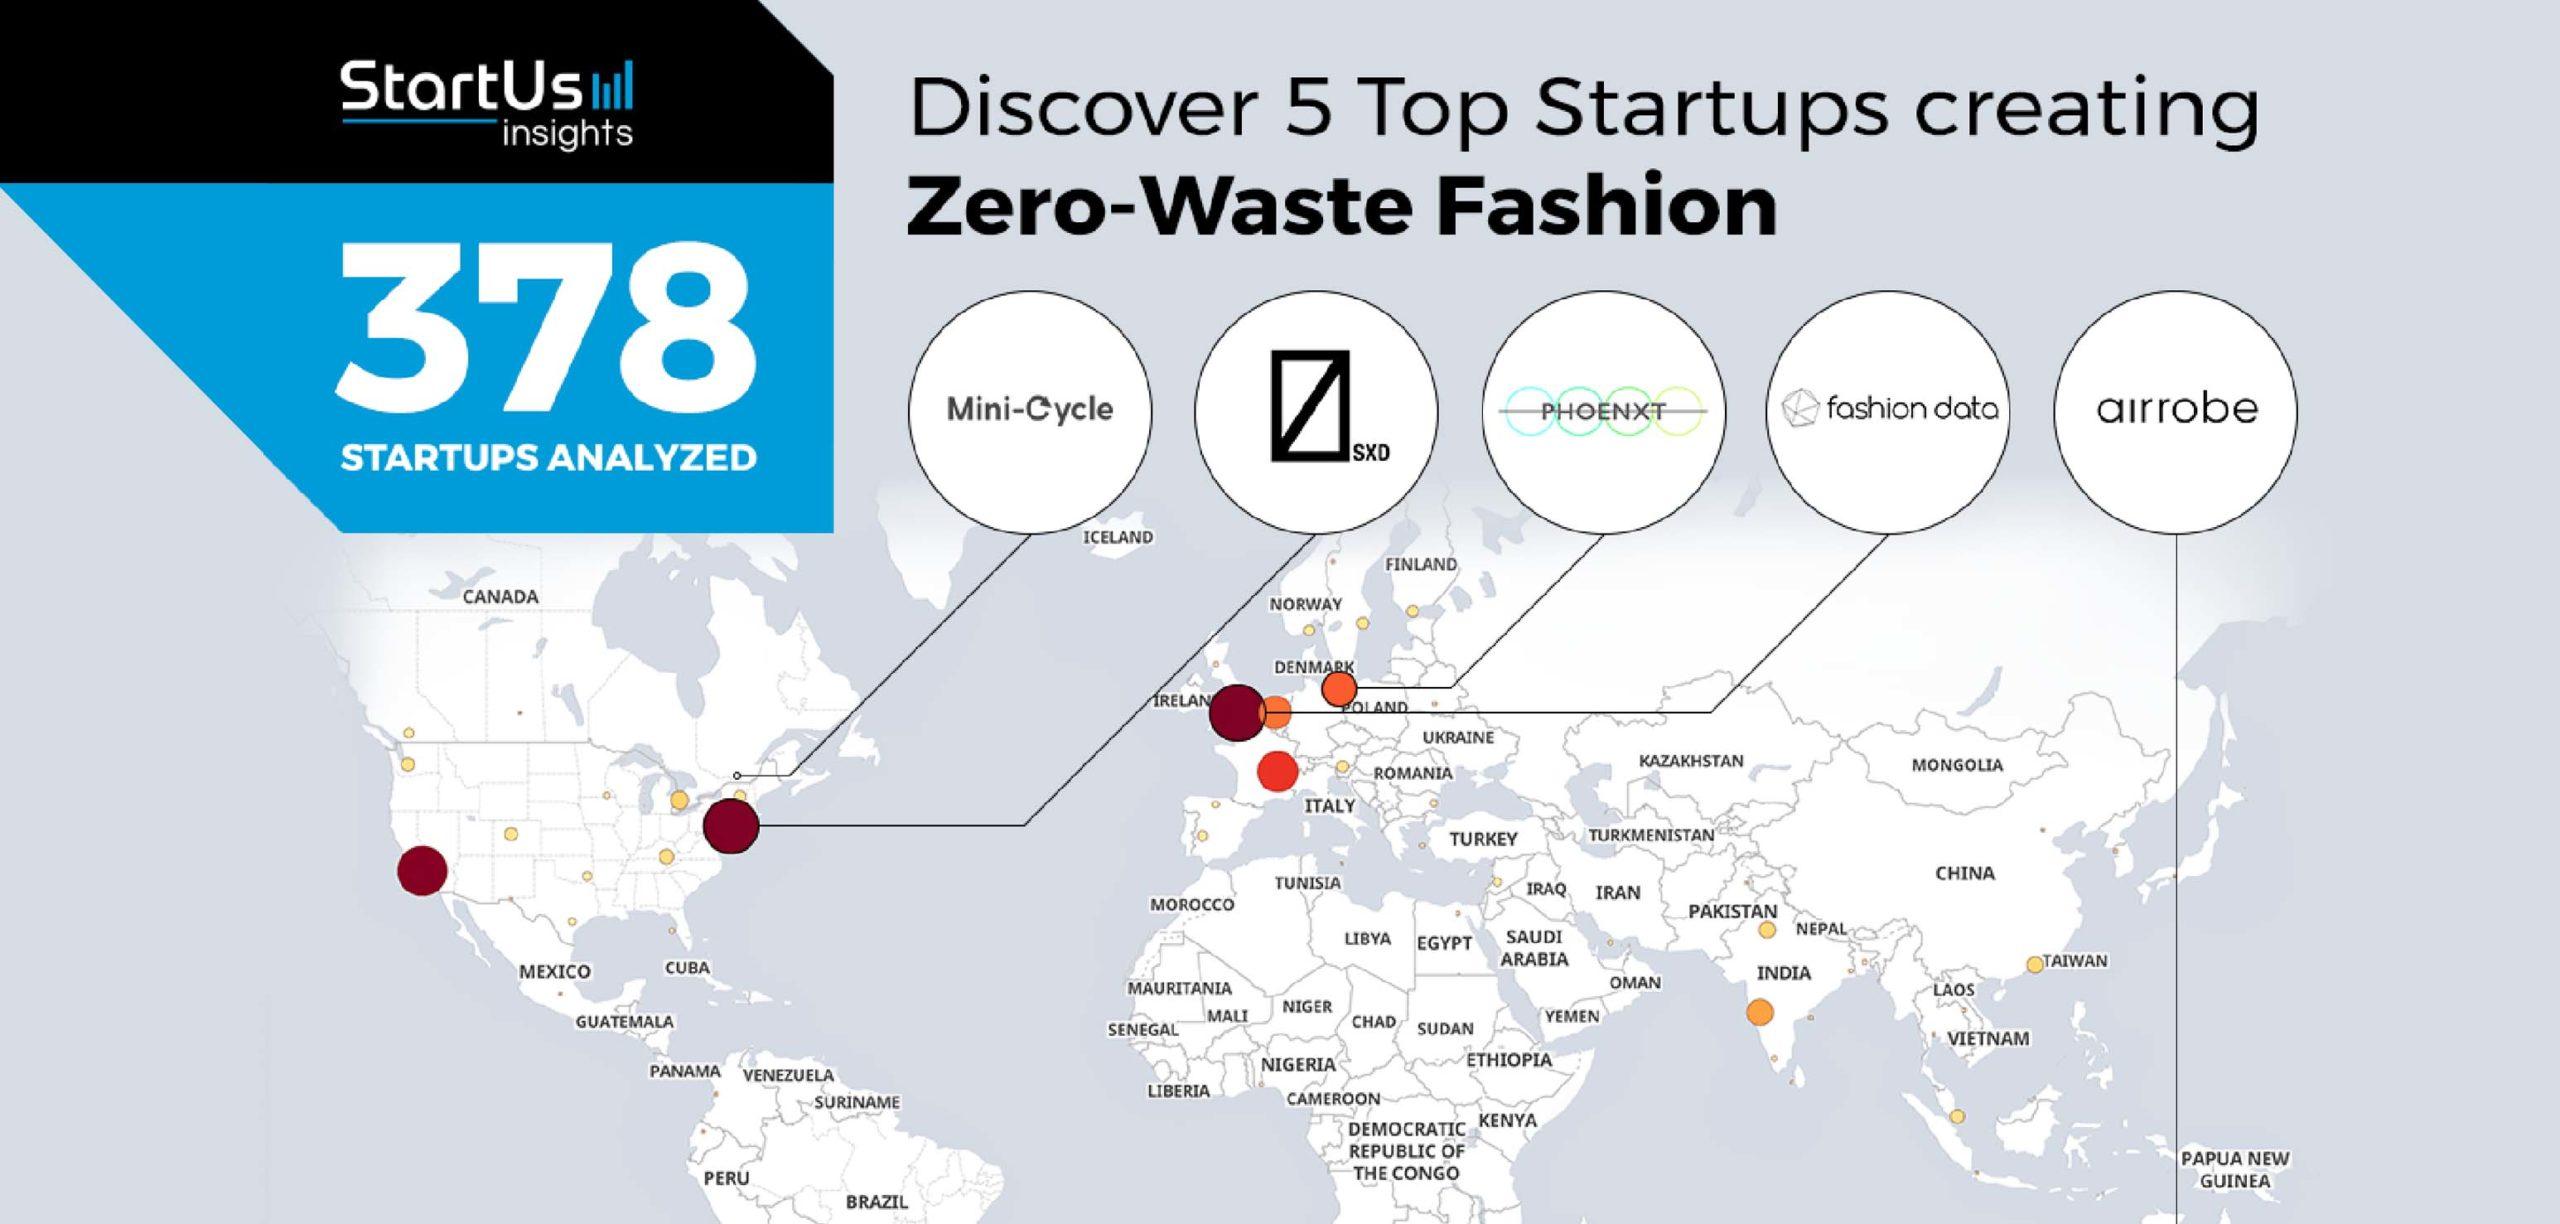 visuel actu startus insight fashion data